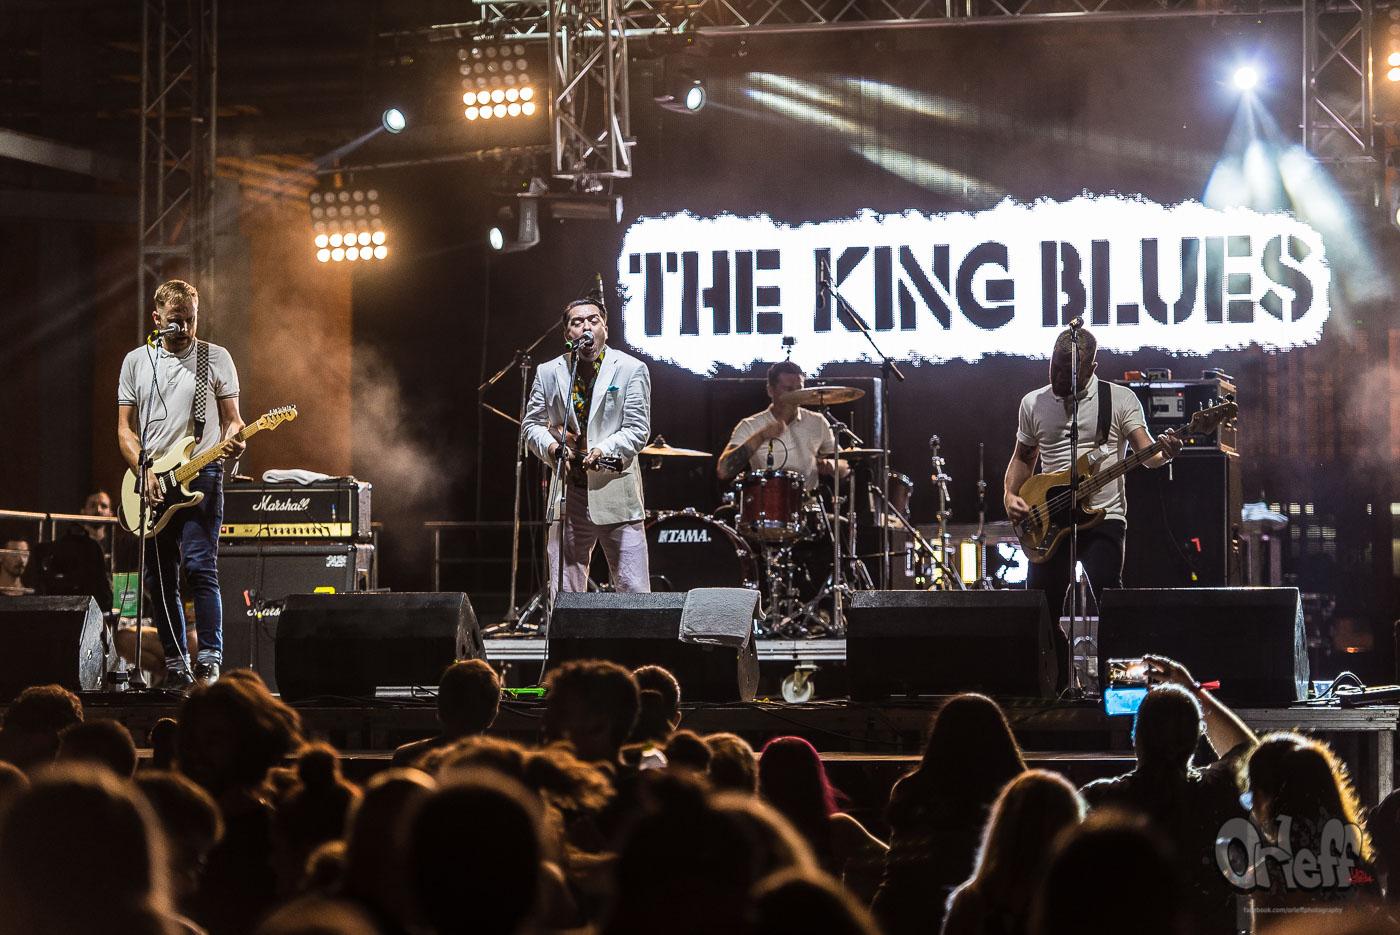 The King Blues @ Street Mode Festival, Thessaloniki, 2017